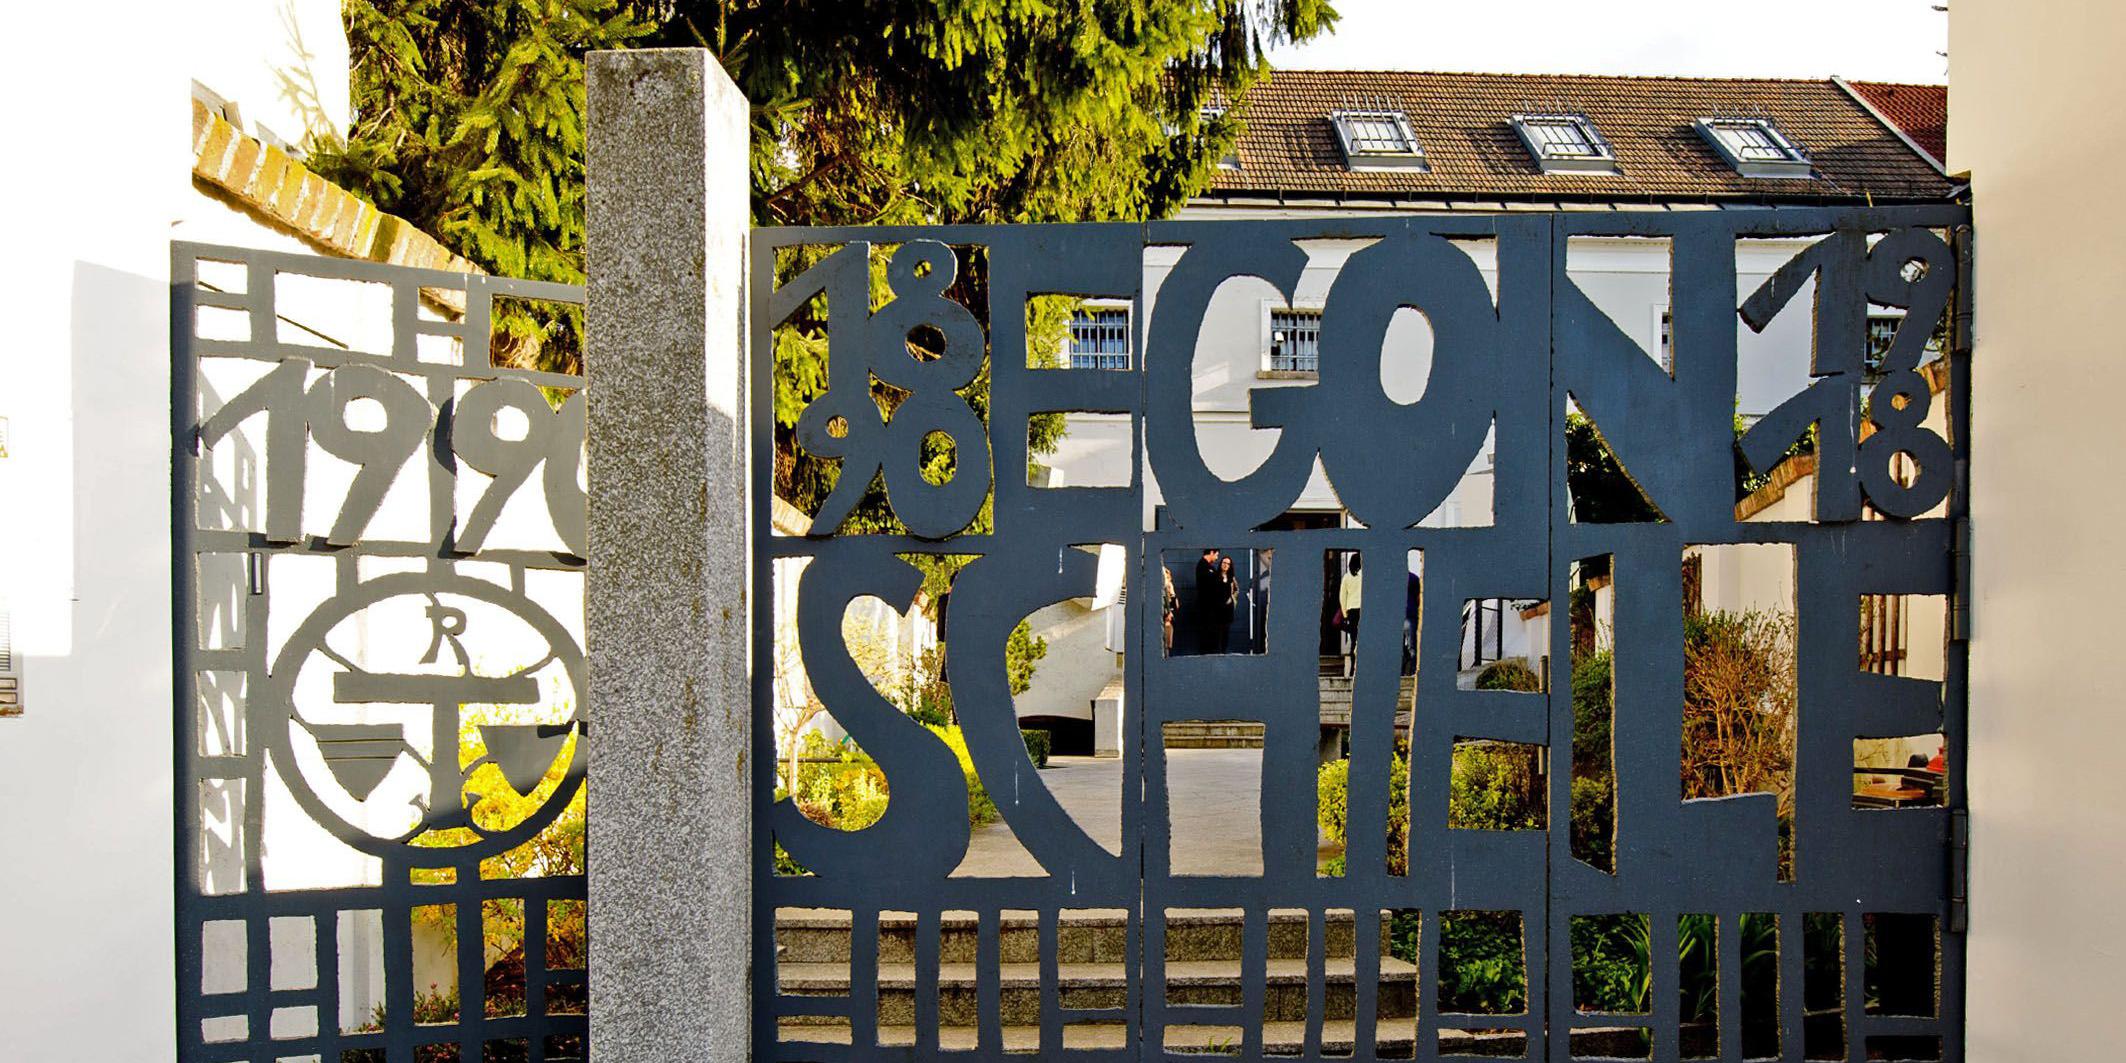 Einganstor Schiele Museum